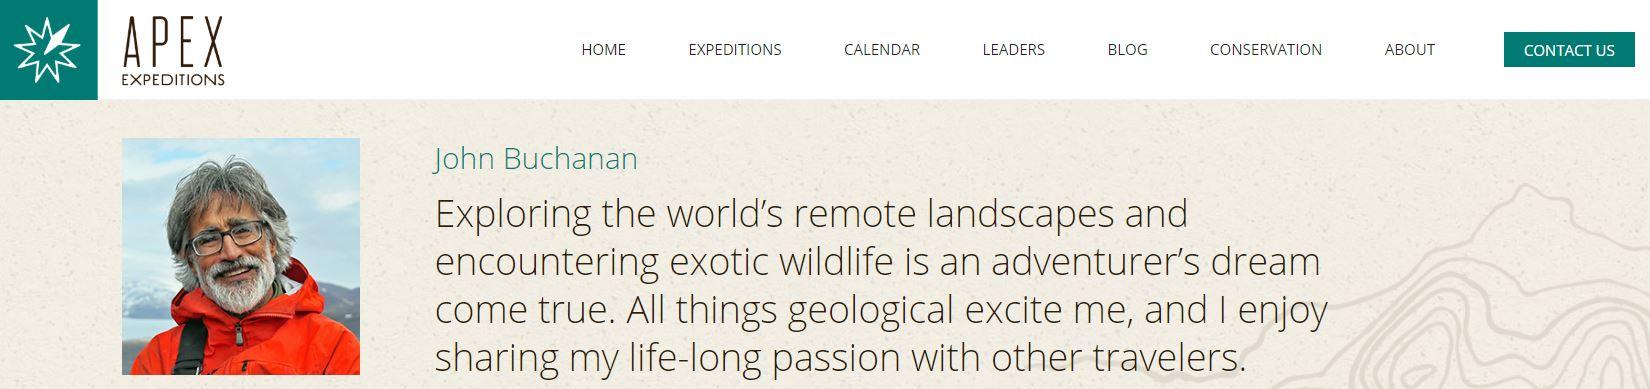 Here's the link:   https://www.apex-expeditions.com/leaders/john-buchanan/